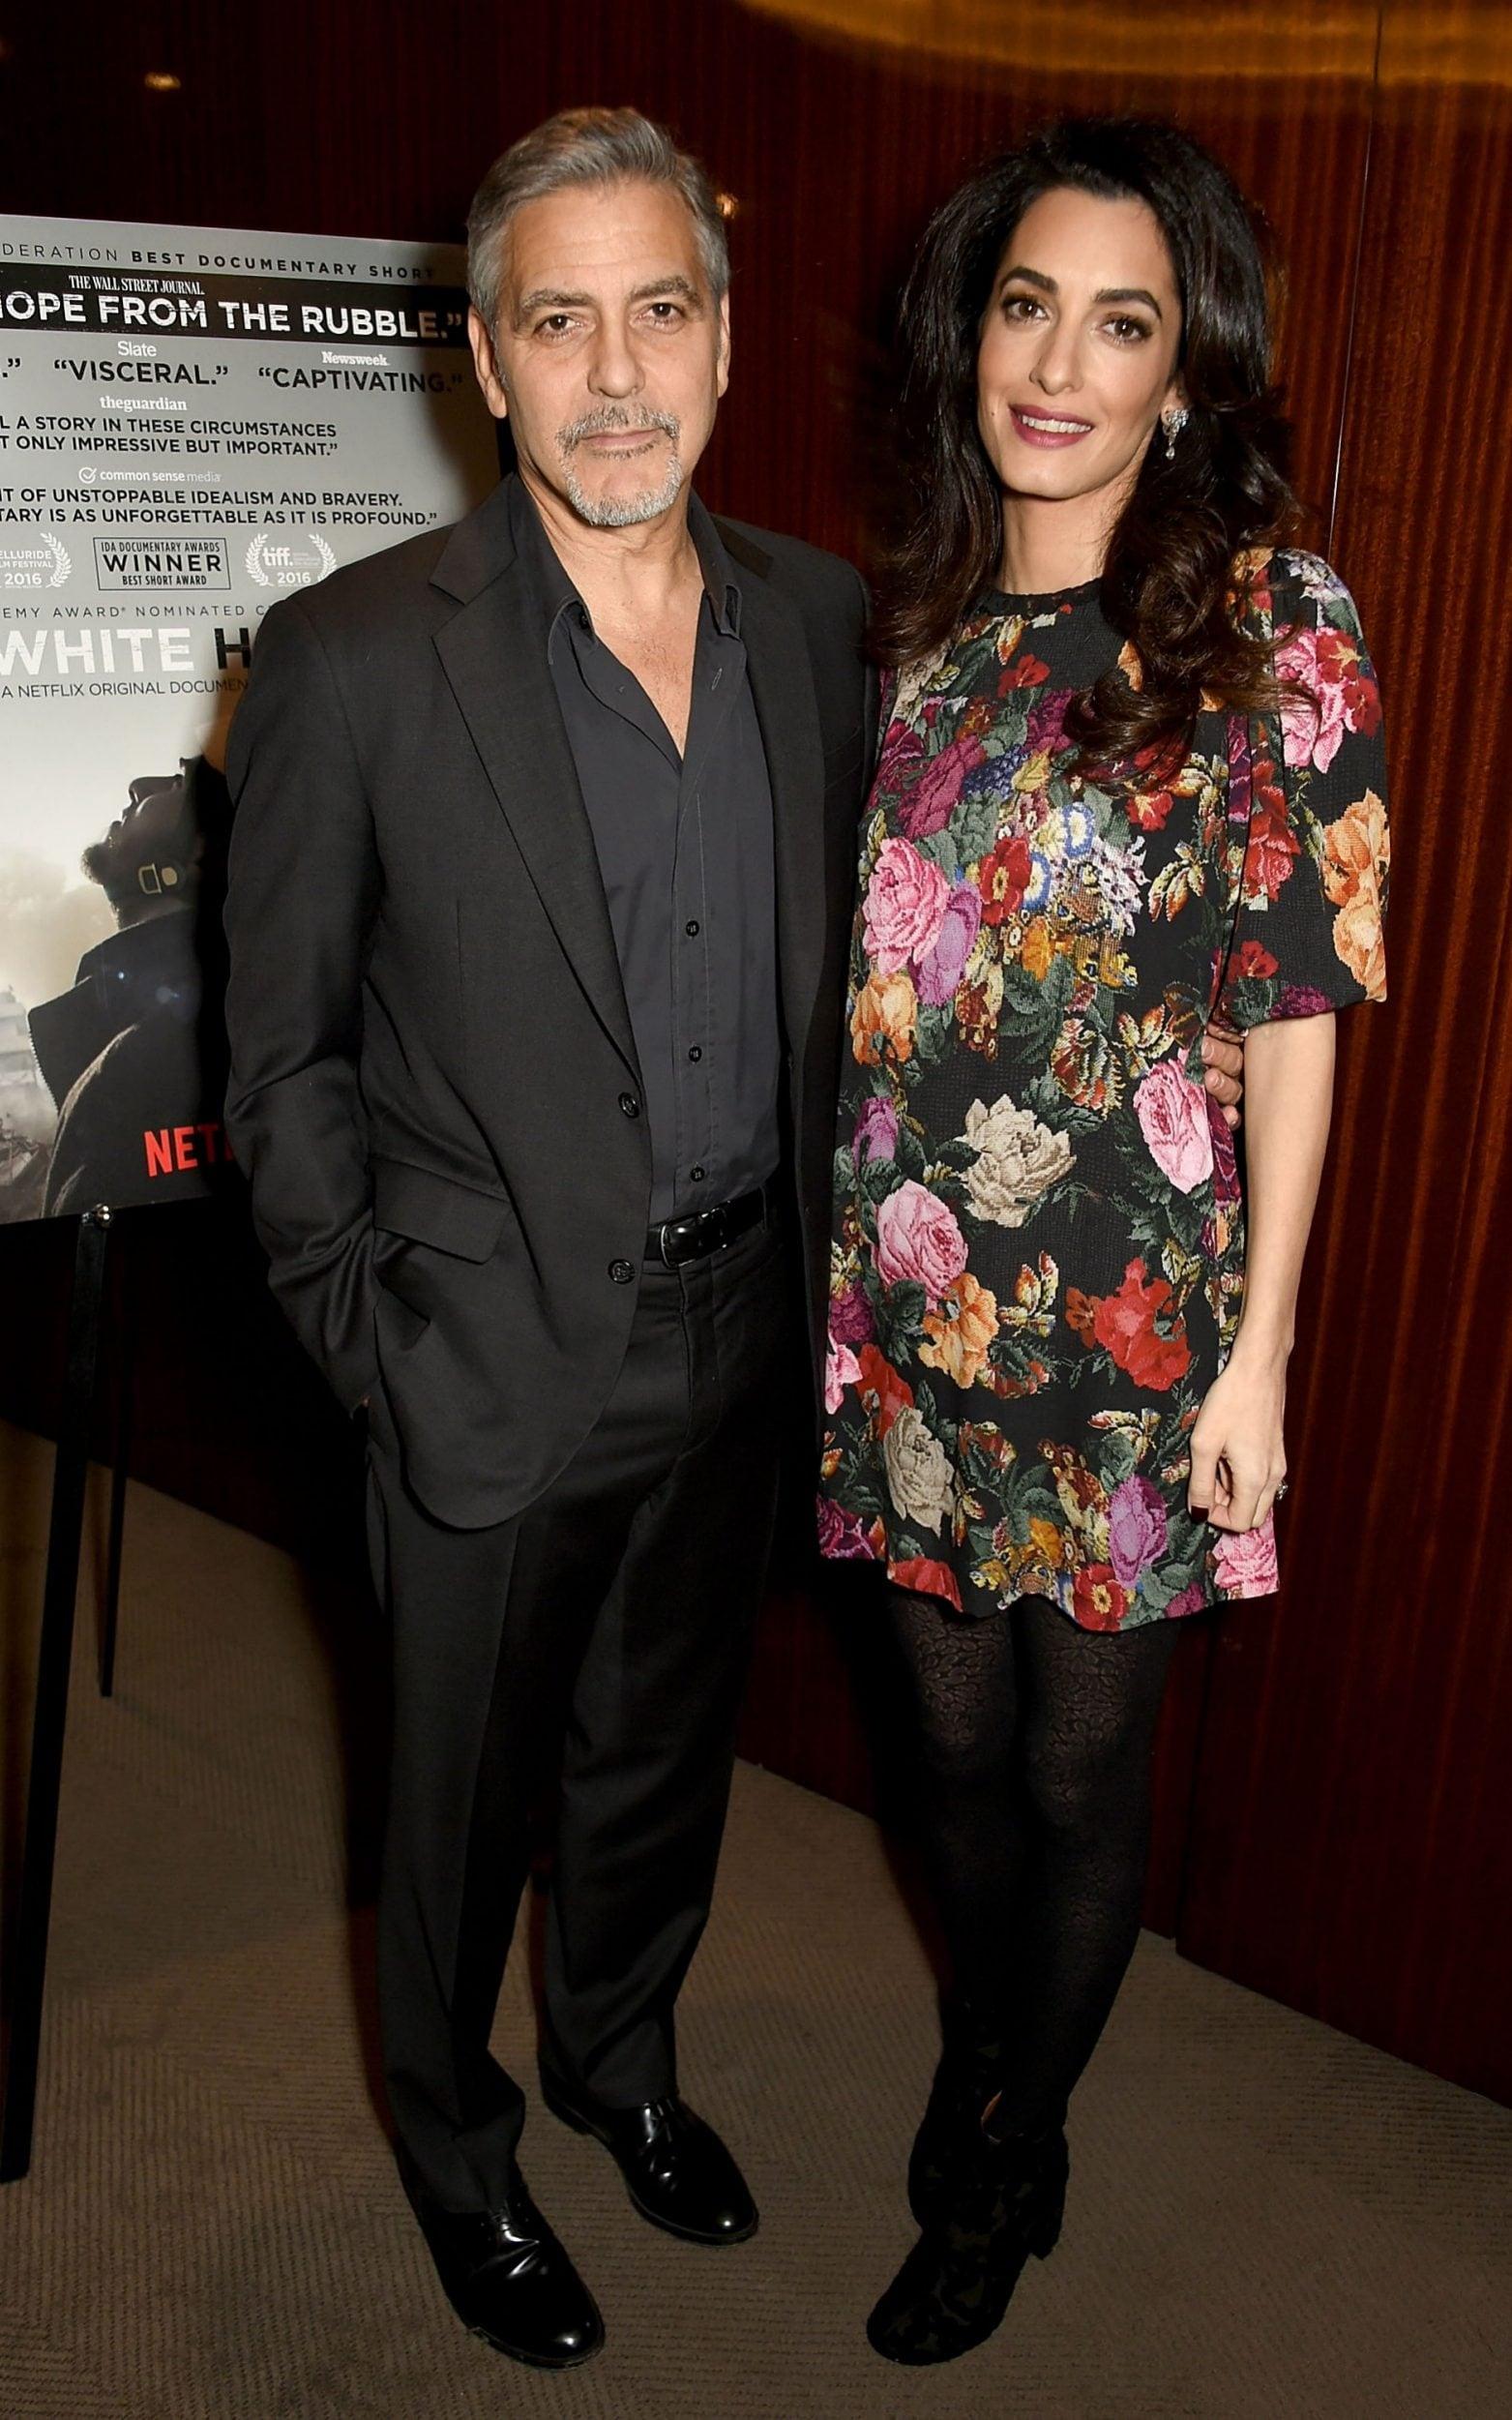 Amal Clooney wears Dolce & Gabbana